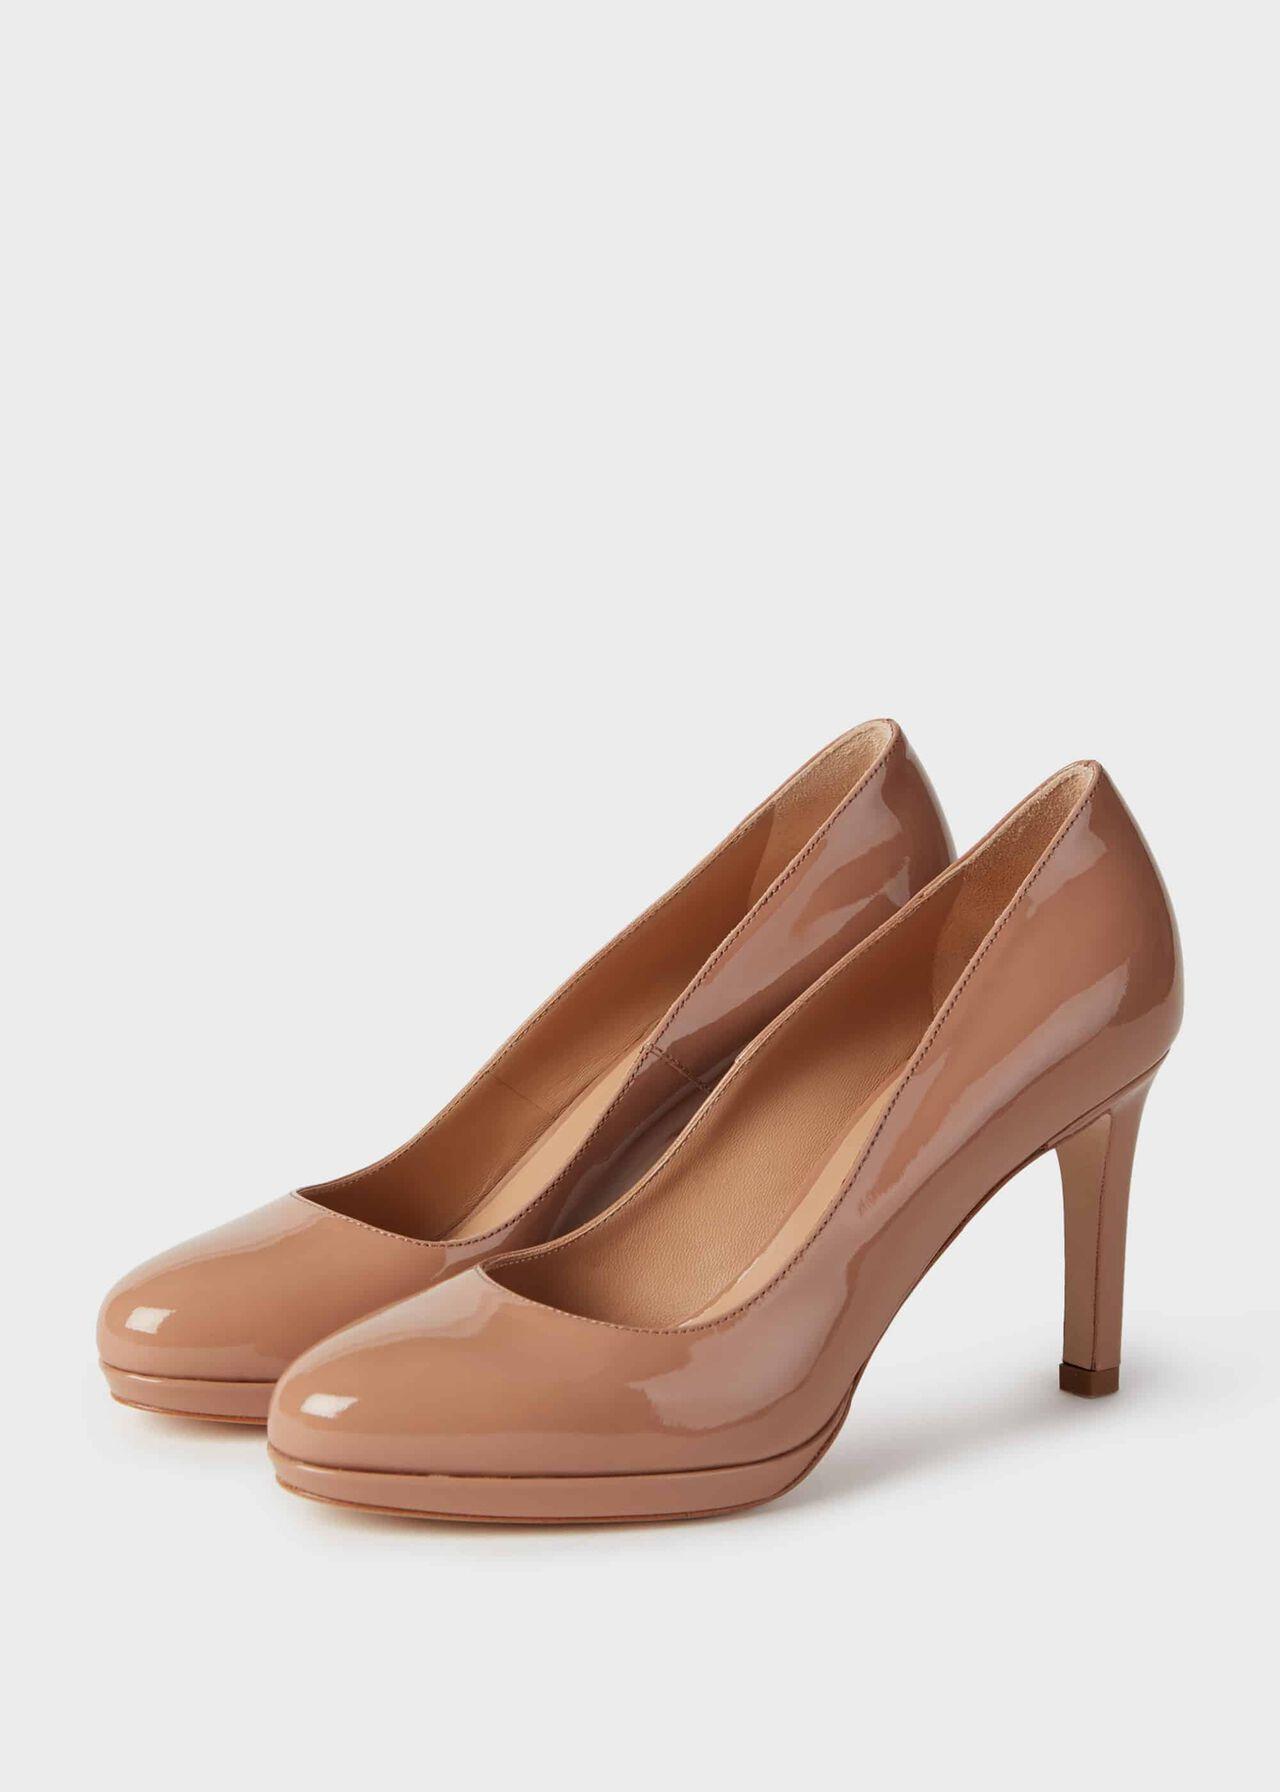 Julietta Patent Stiletto Court Shoes Toasted Almond